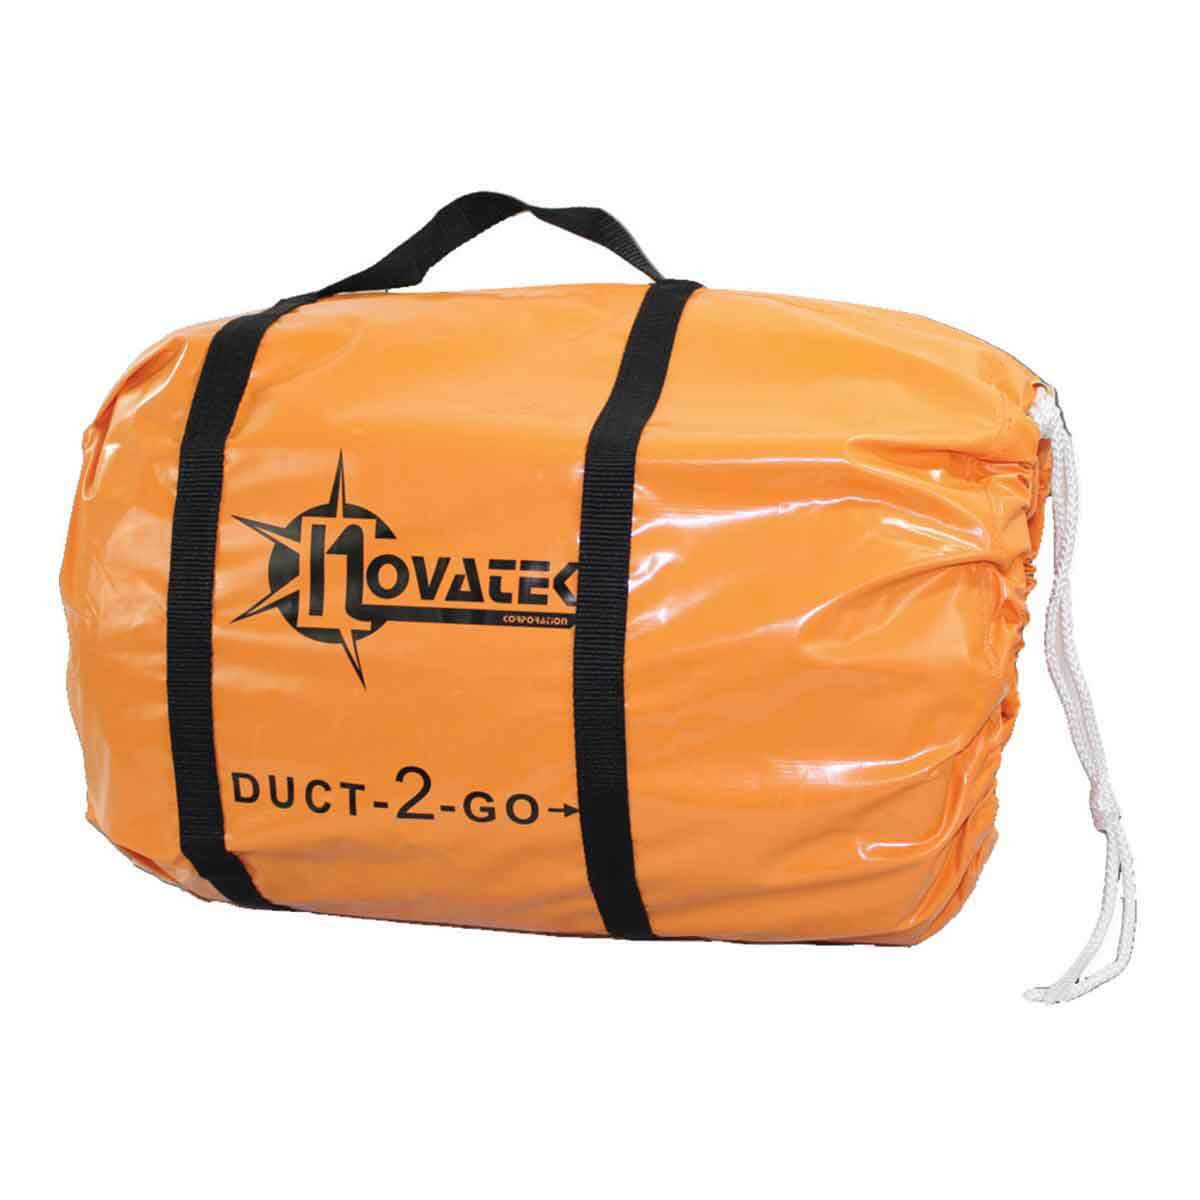 Novatek Novair Duct-2-Go Air Ducting Carrying Case